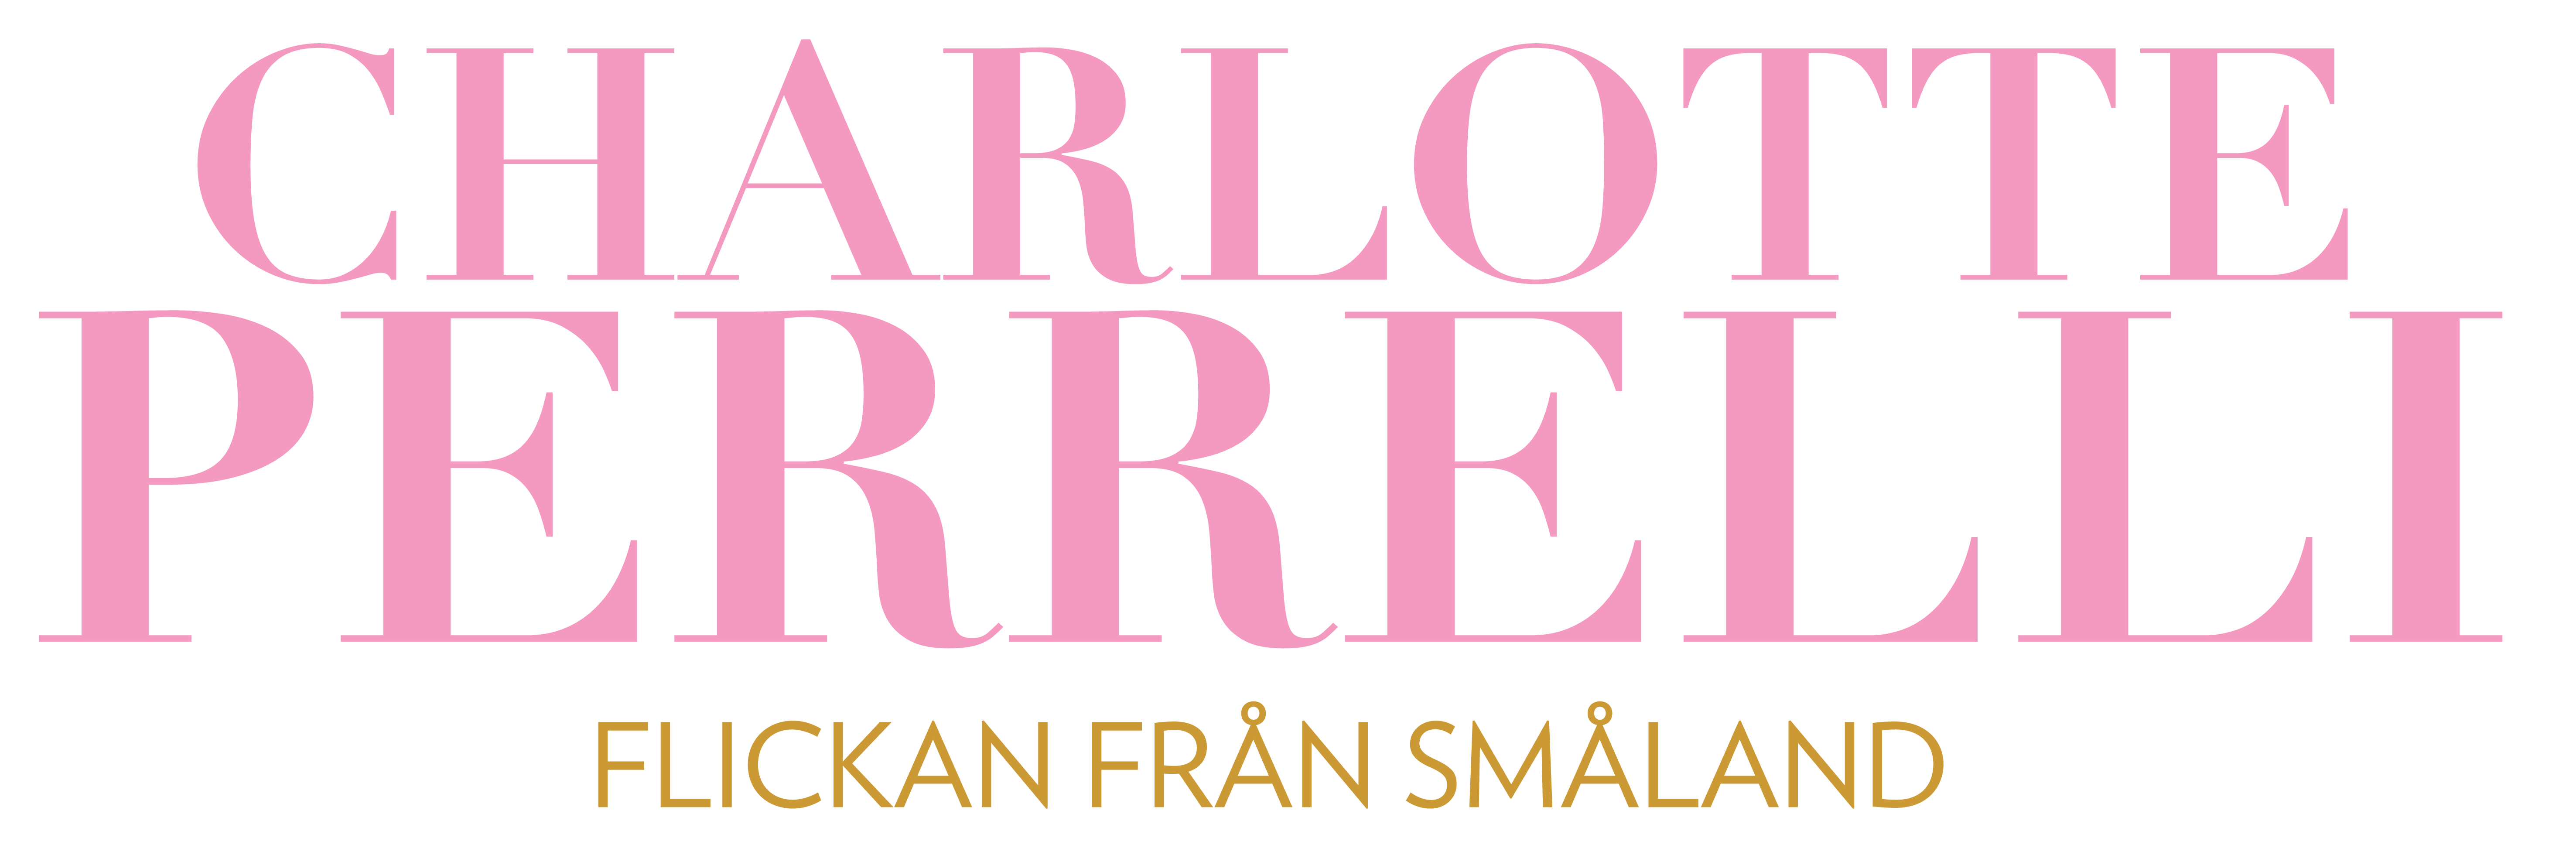 CharlottePerrelli-logo-01